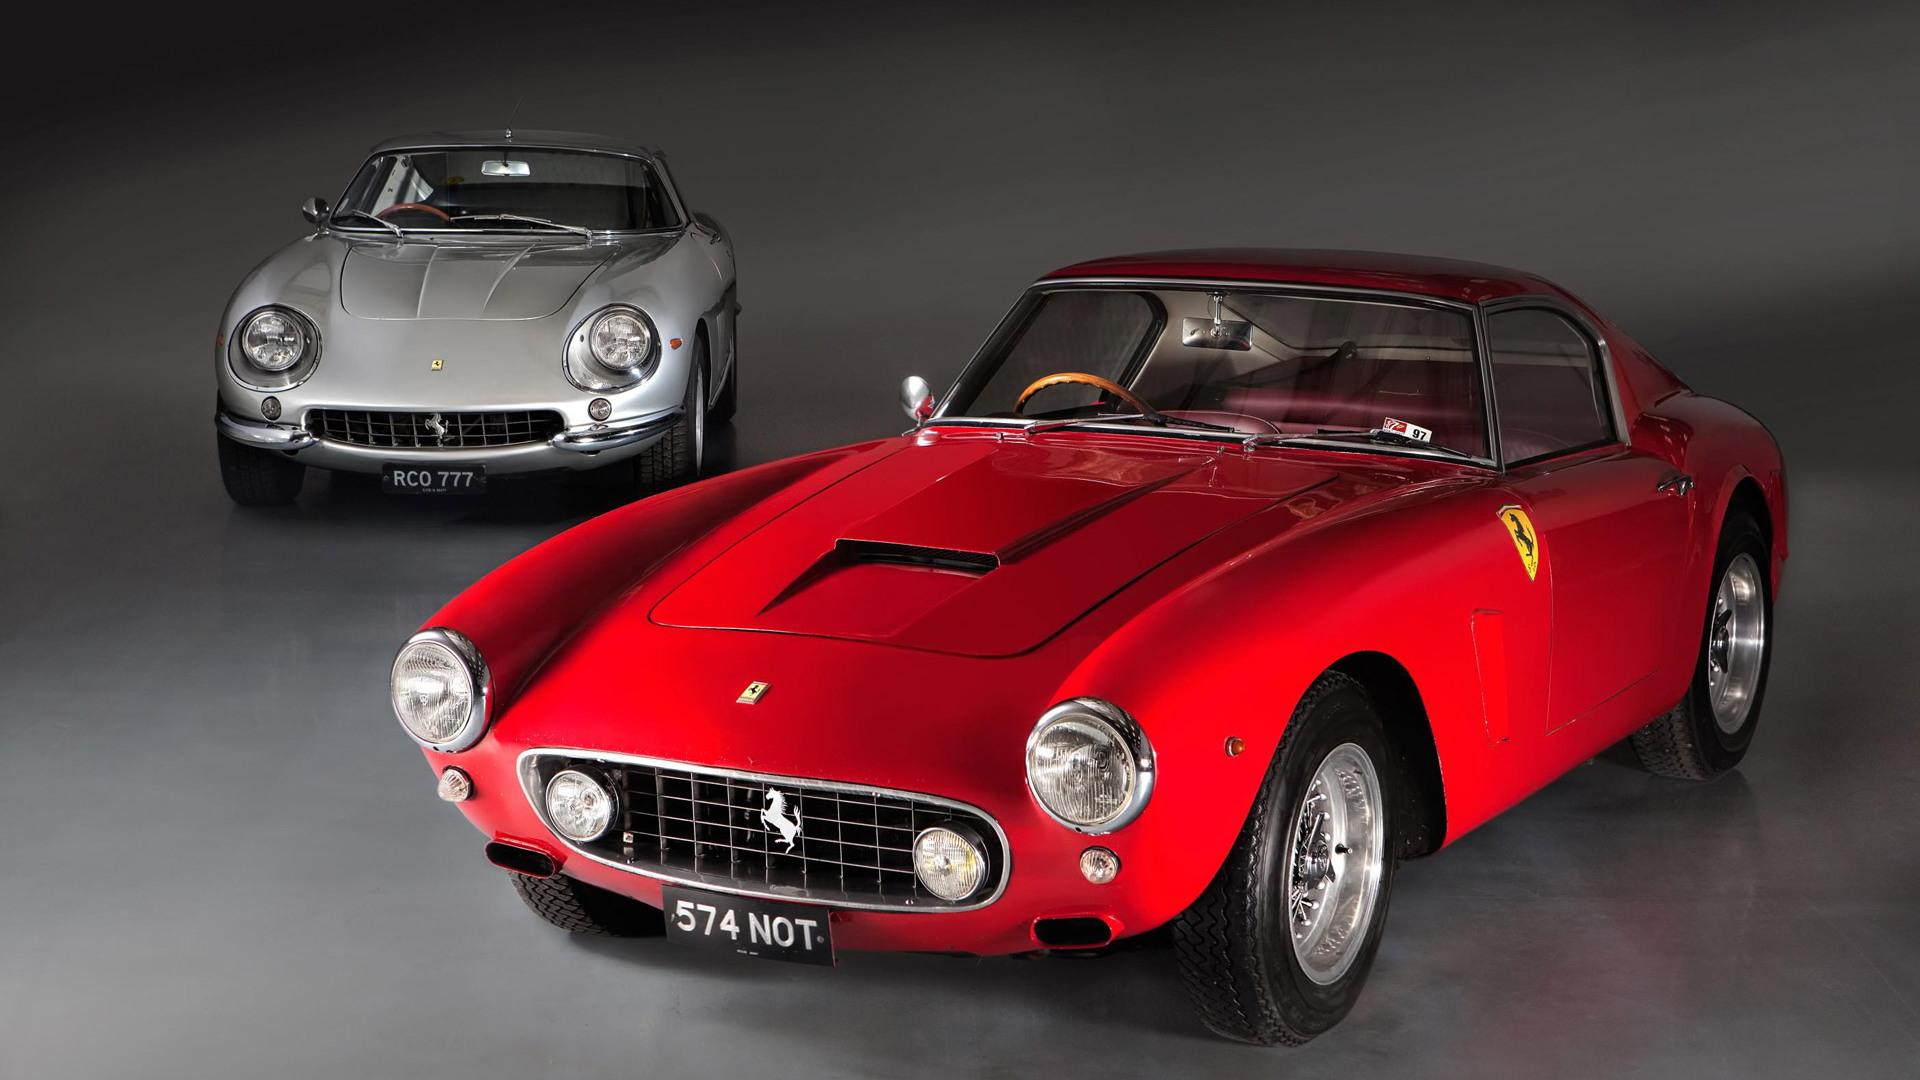 1960 Ferrari 250 GT SWB and 1967 275 GTB/4